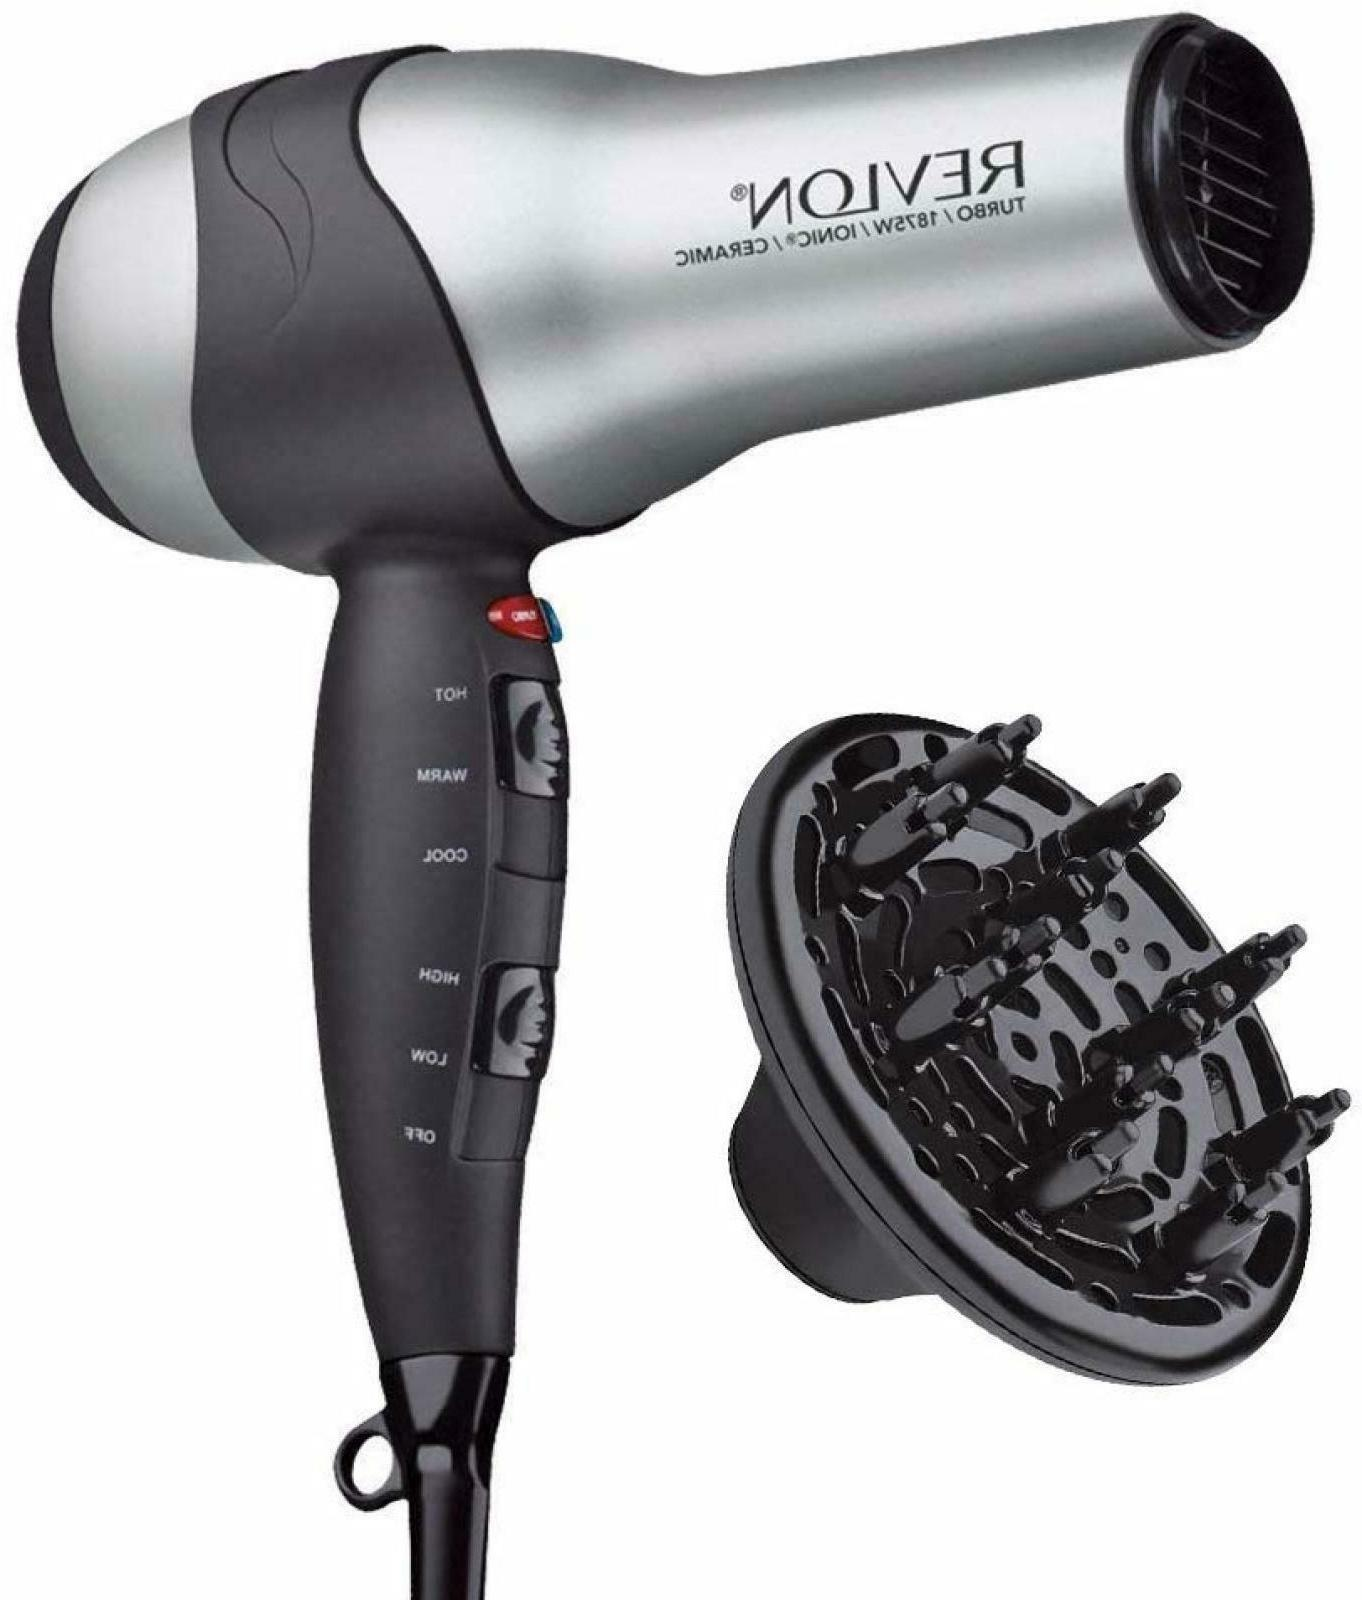 Pro Styler 1875W Infrared Tourmaline Ionic Hair Blow Dryer W